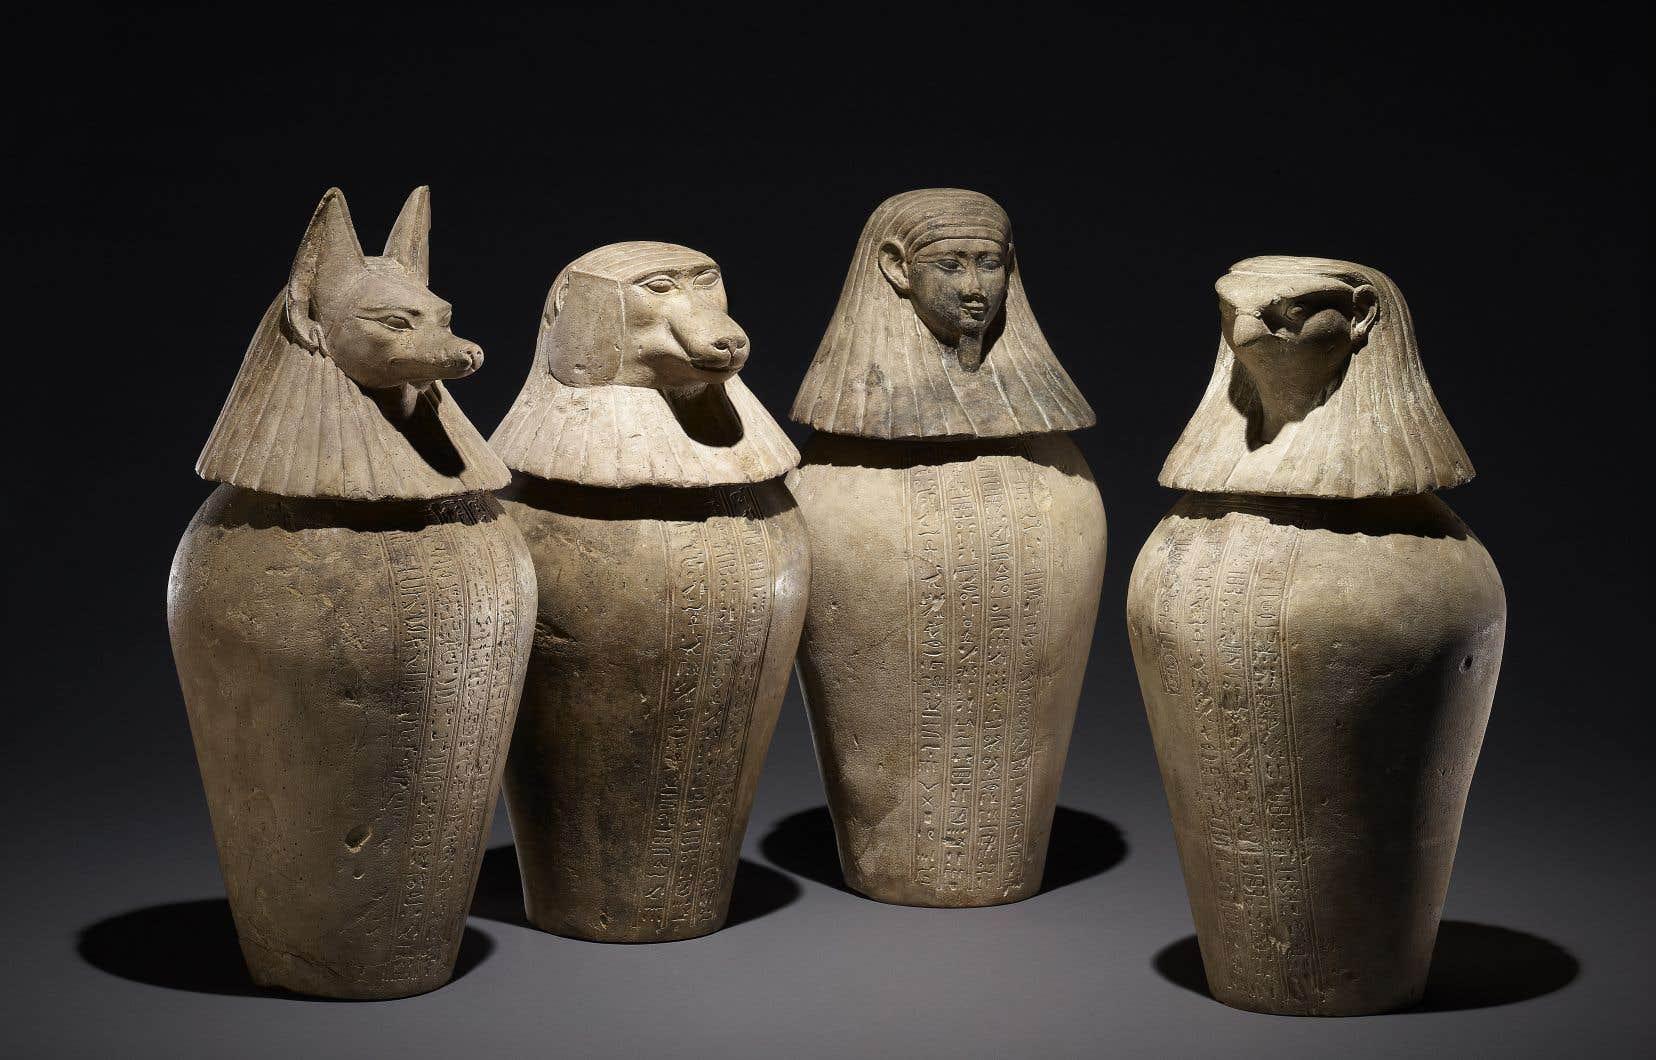 Vases canopes de Djedbastetiouefankh, XXXe dynastie, vers 380-343 avant J.-C, Hawara, Égypte,calcaire, EA 22374, EA 22375, EA 22376 et EA 22377.